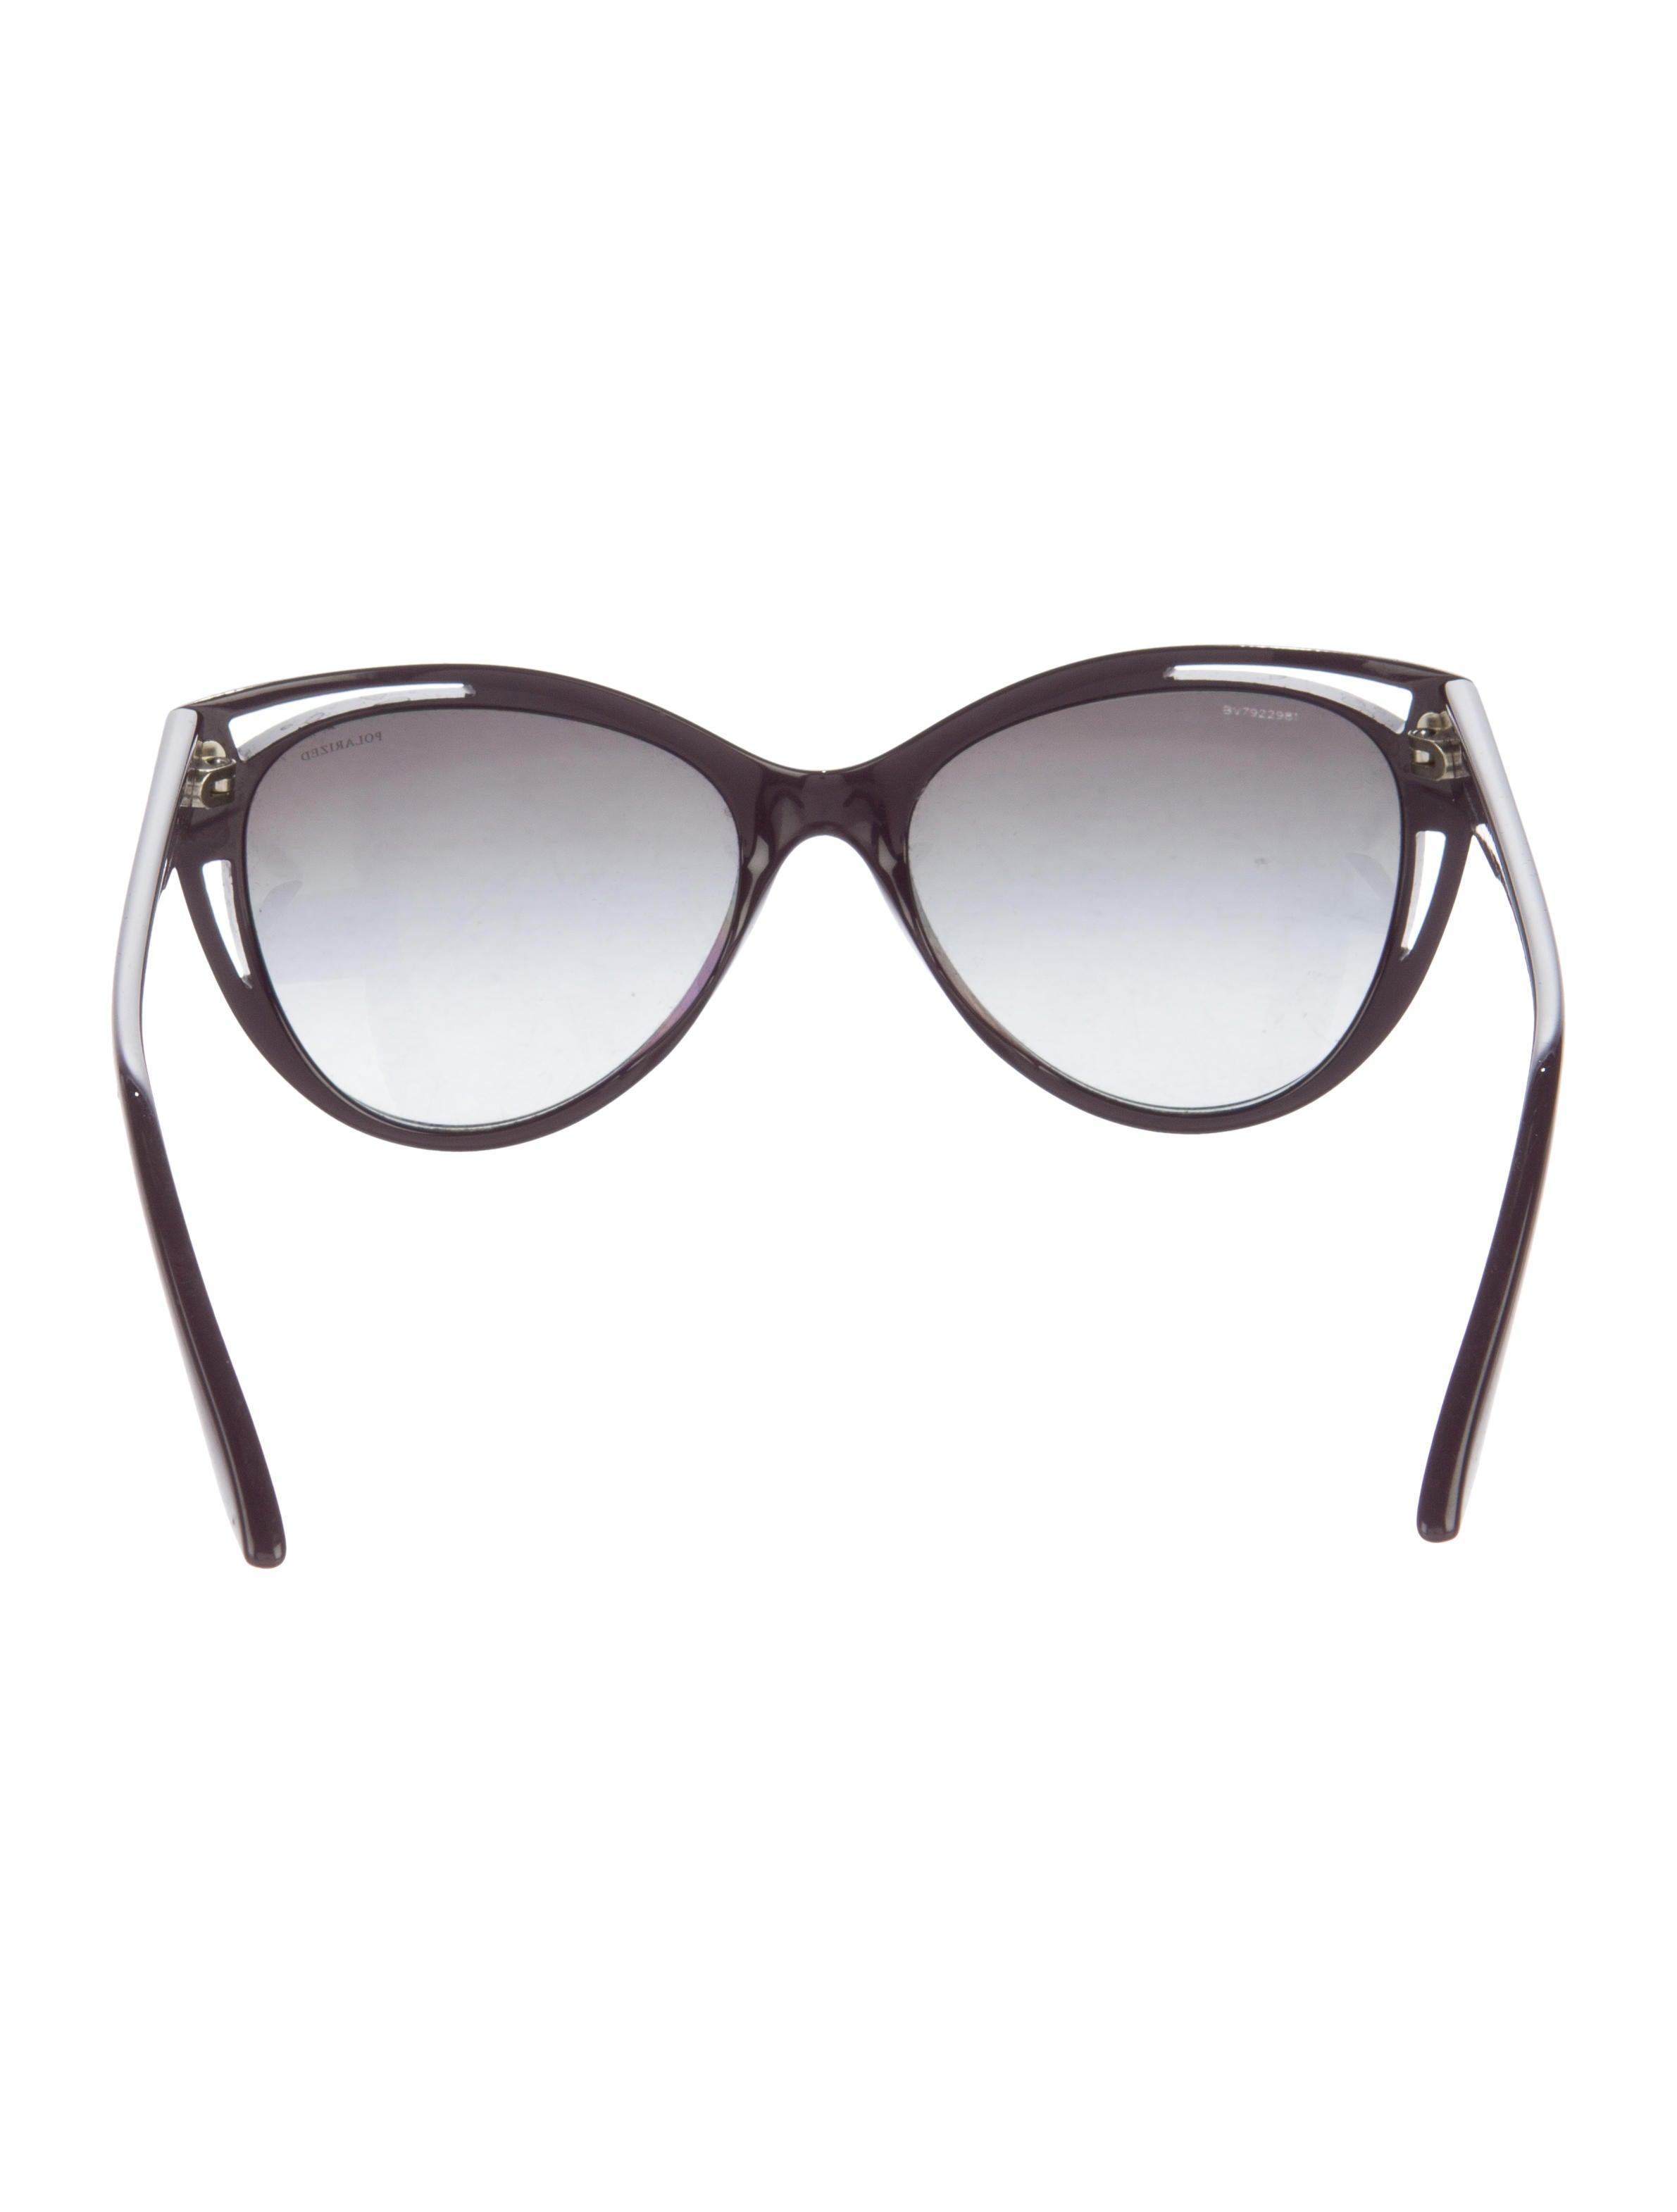 faf6fd4250e7 Versace Cat Eye Shield Sunglasses